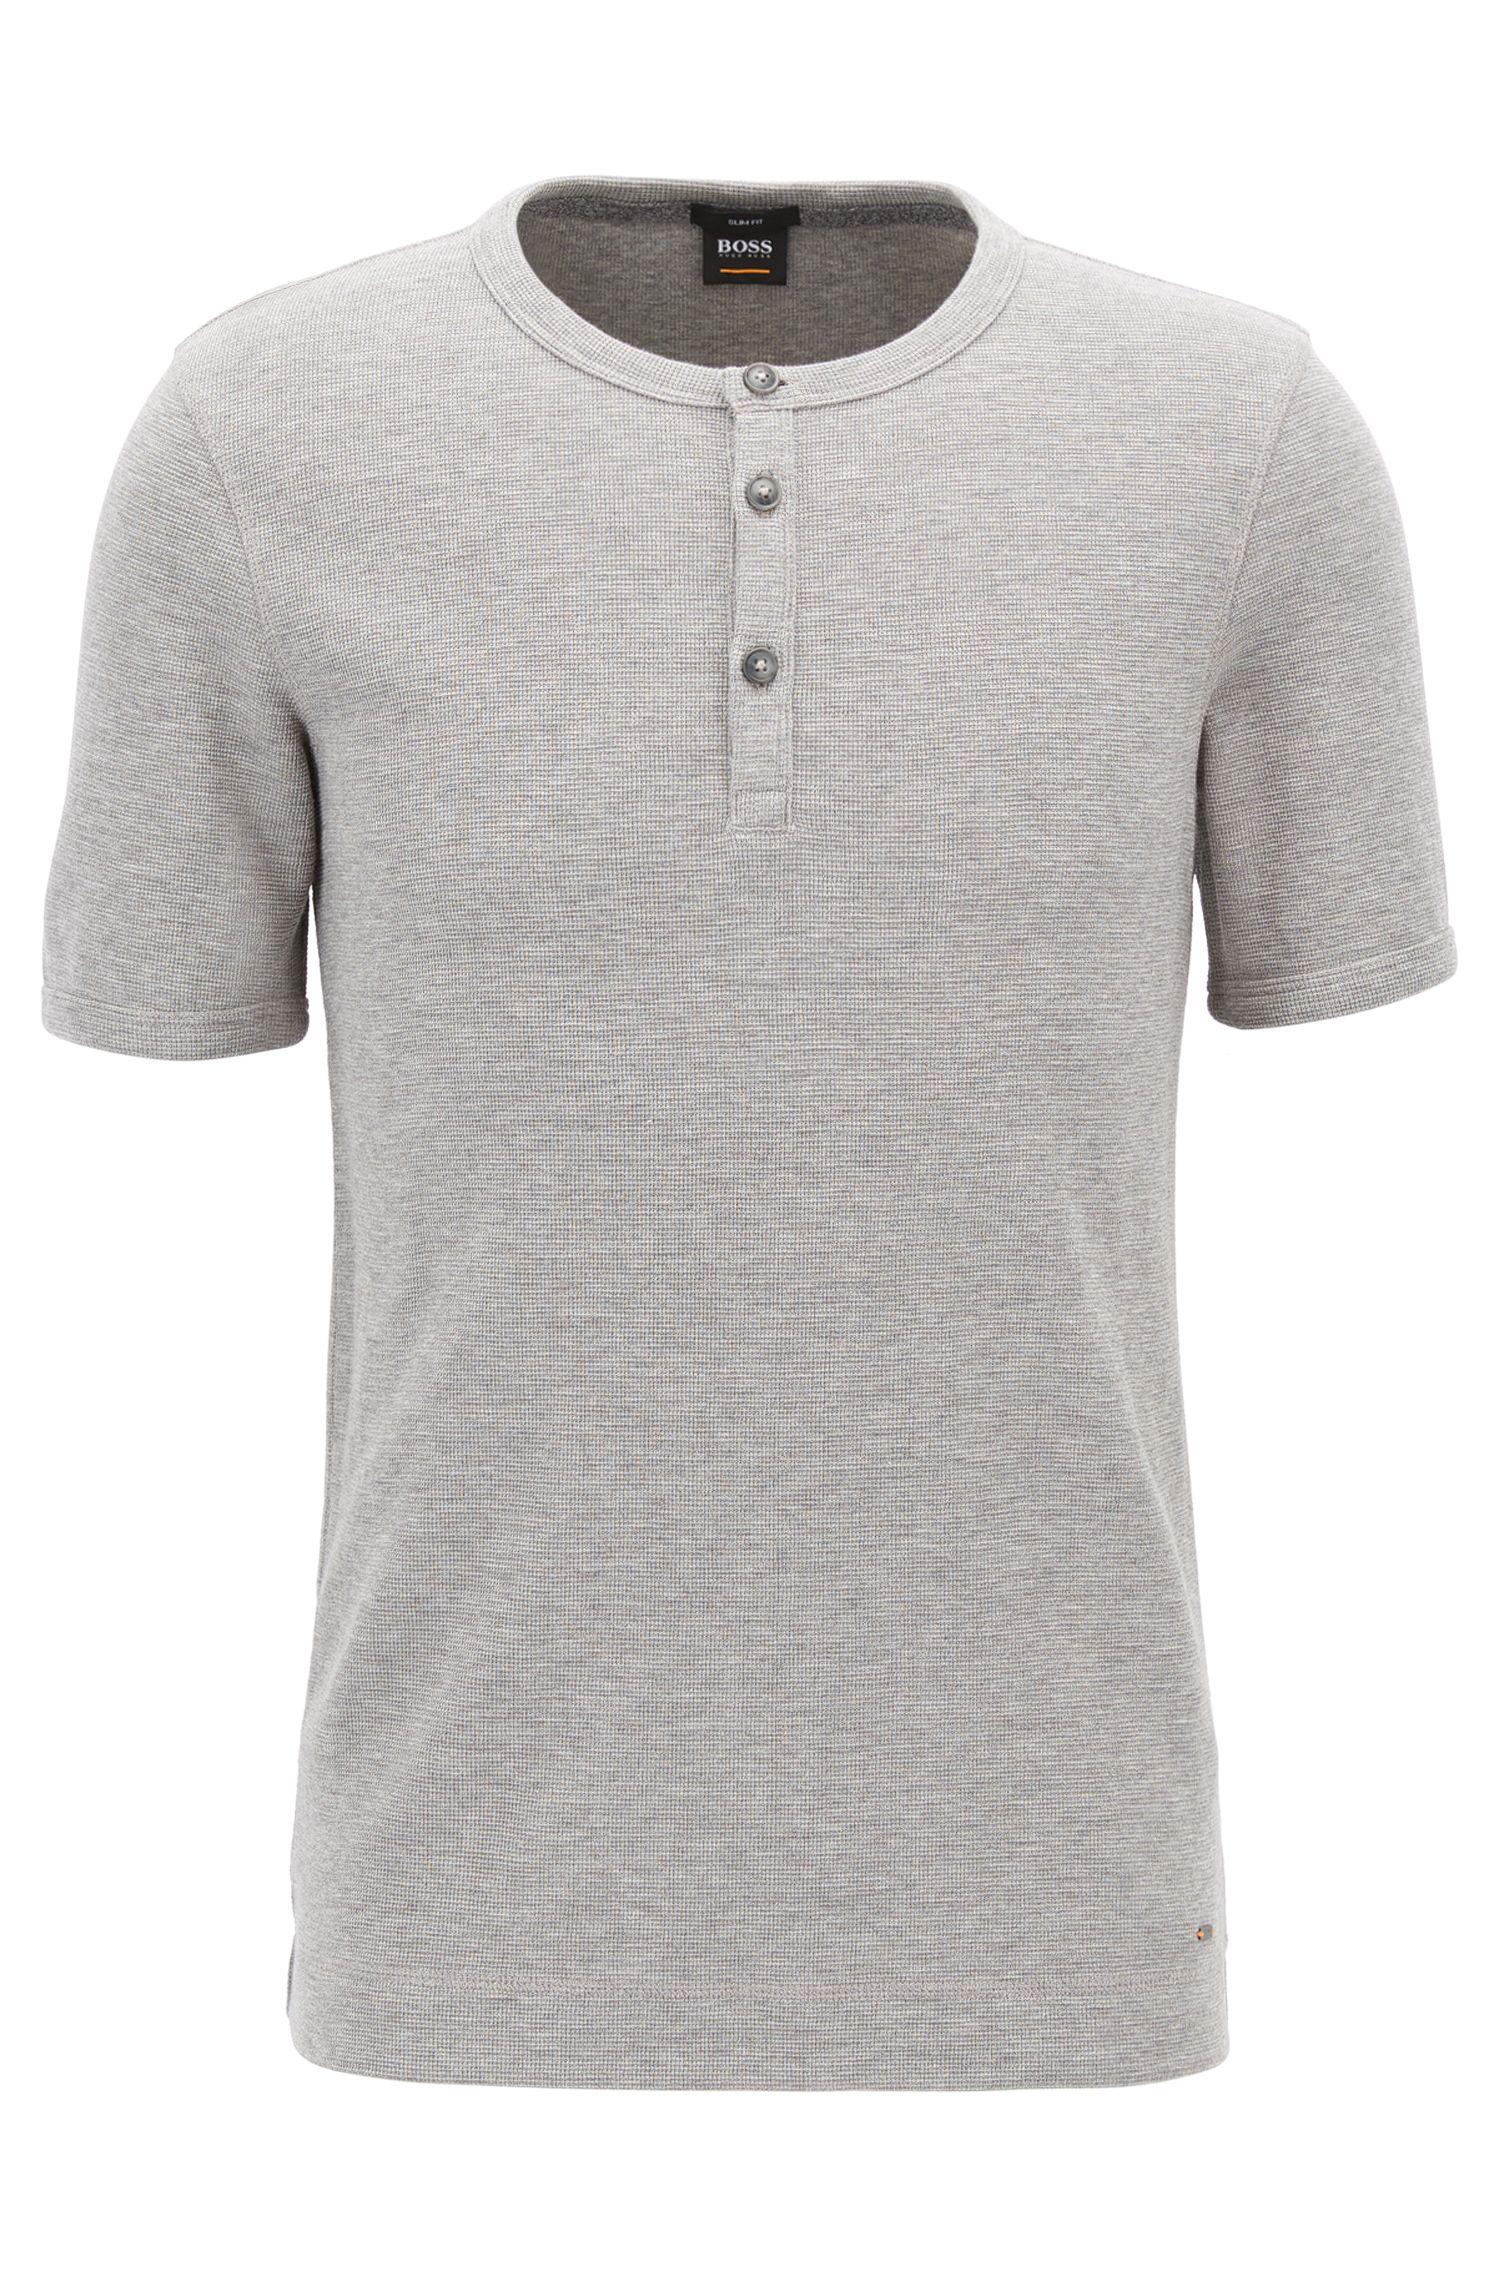 Camiseta slim fit estilo Henley en algodón jaspeado